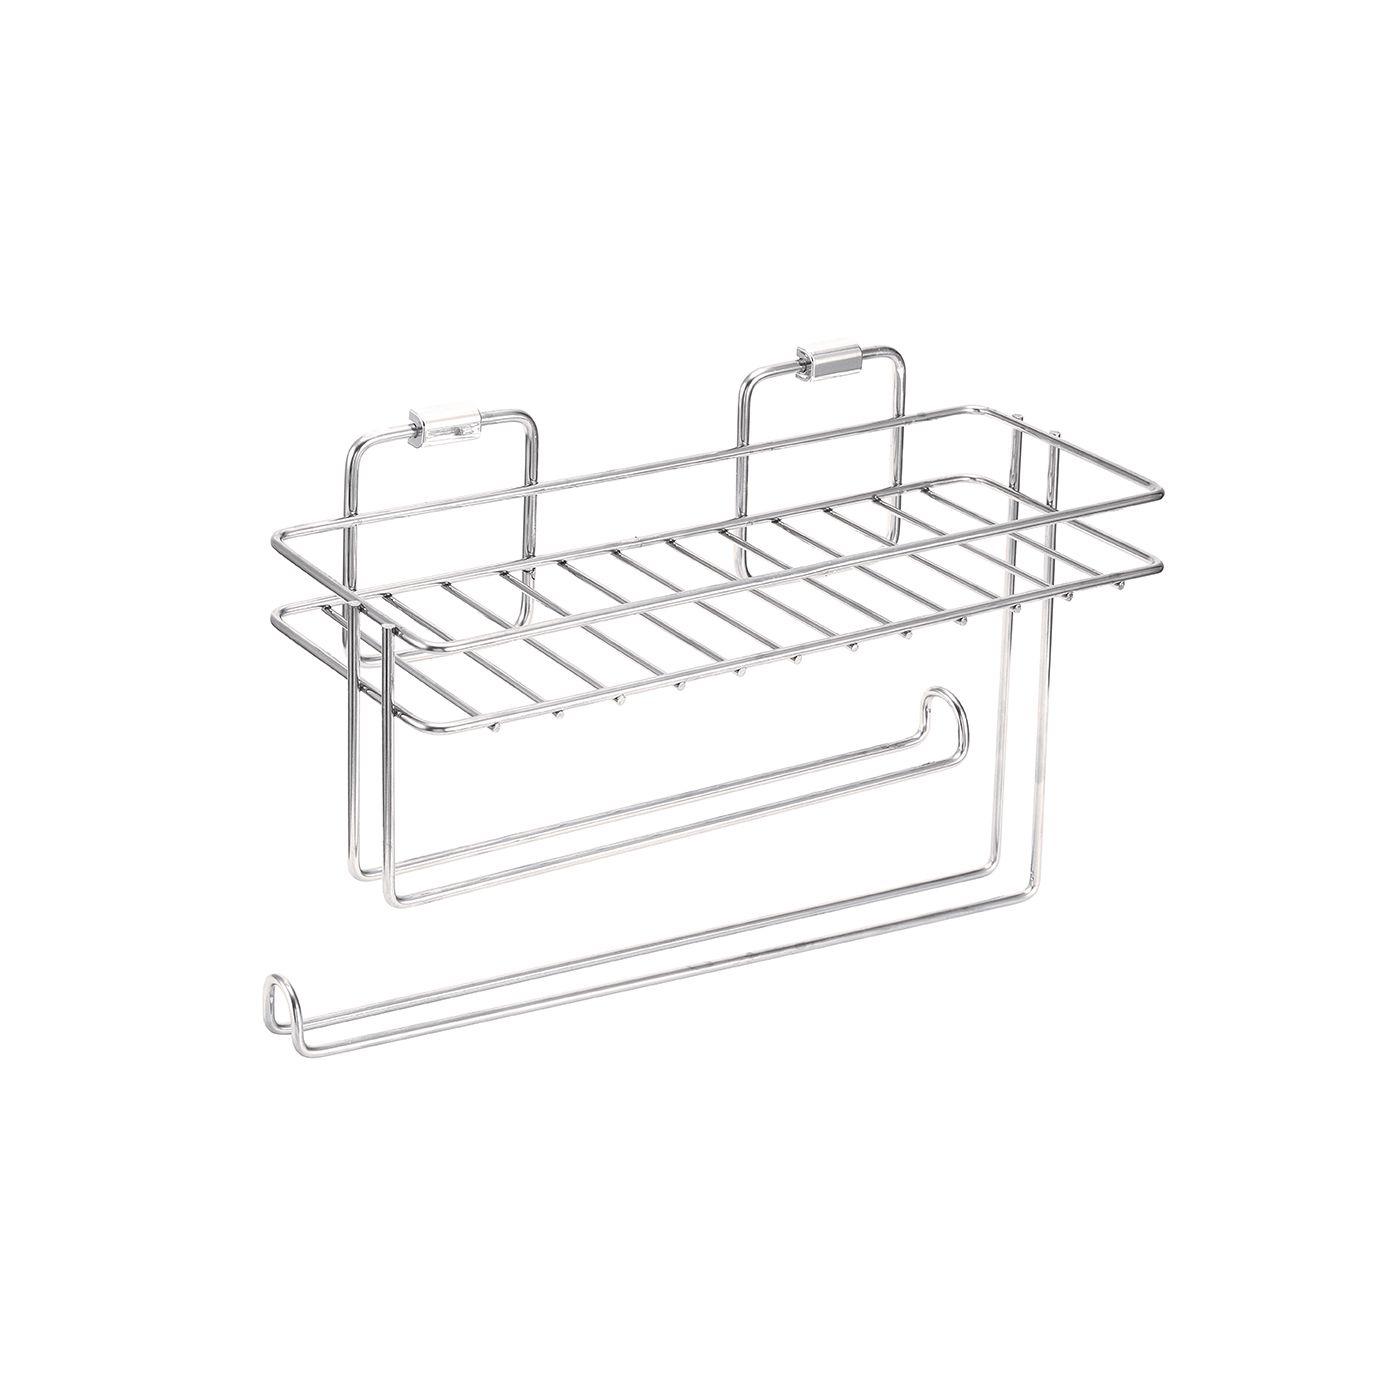 Aéreo Multiuso Flat Porta Condimentos e rolos